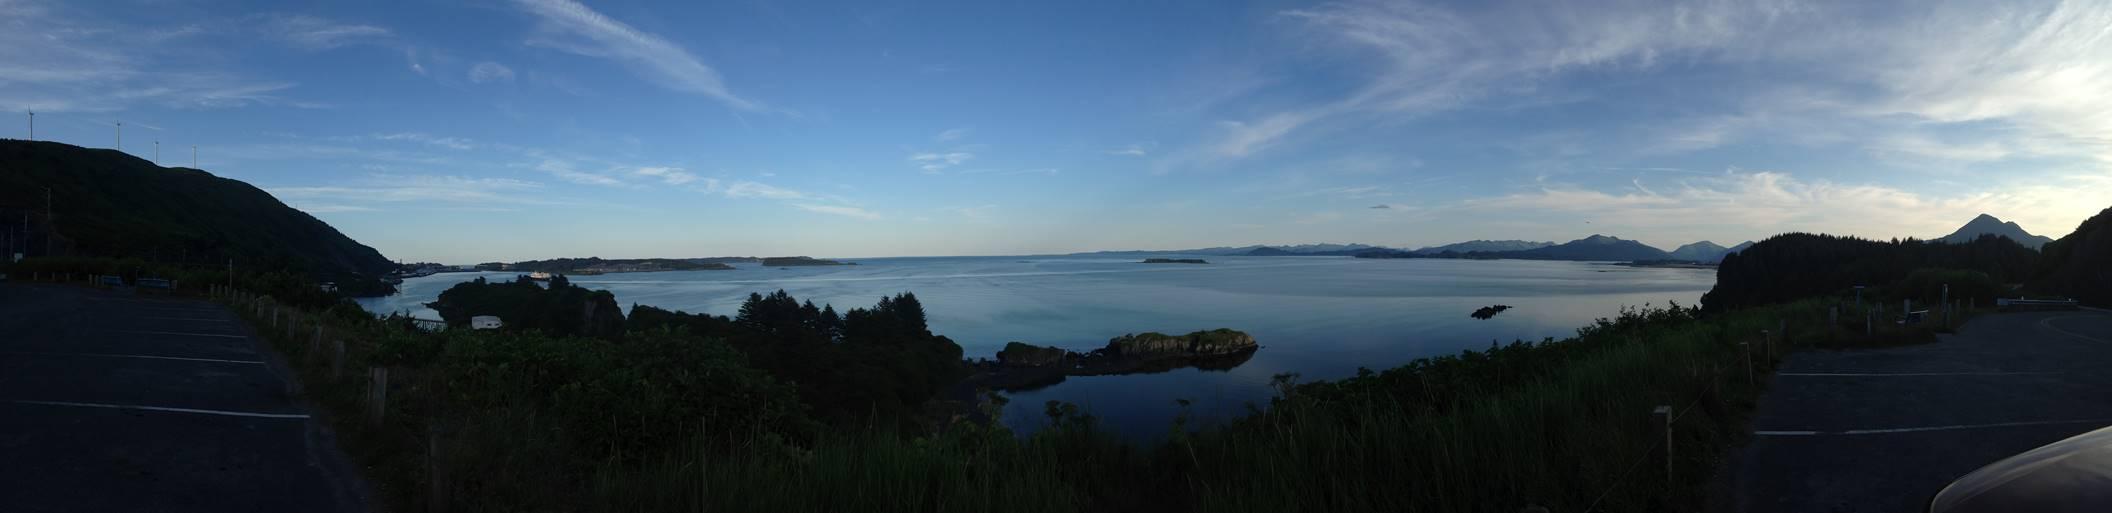 View from Kodiak Island, Alaska; port of Kodiak on left (below wind turbines)